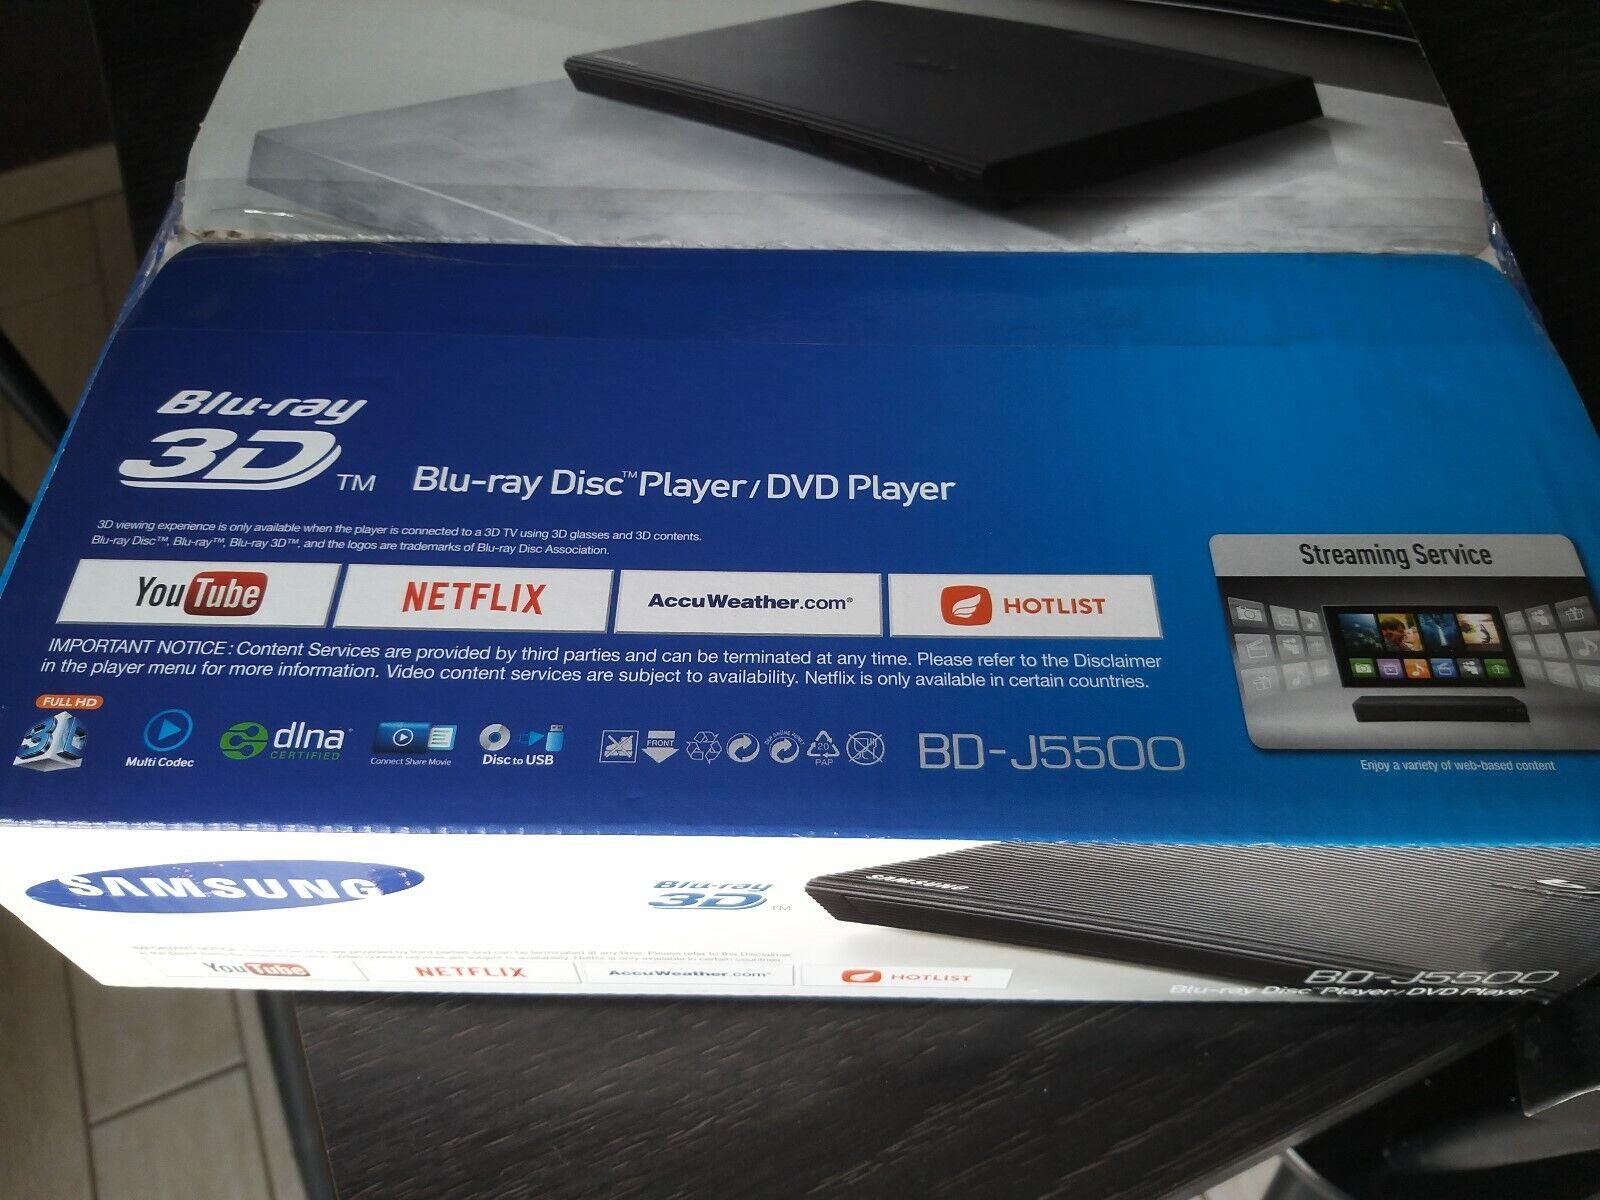 Samsung BDJ-5500 Curved 3D Blu-ray Player Schwarz